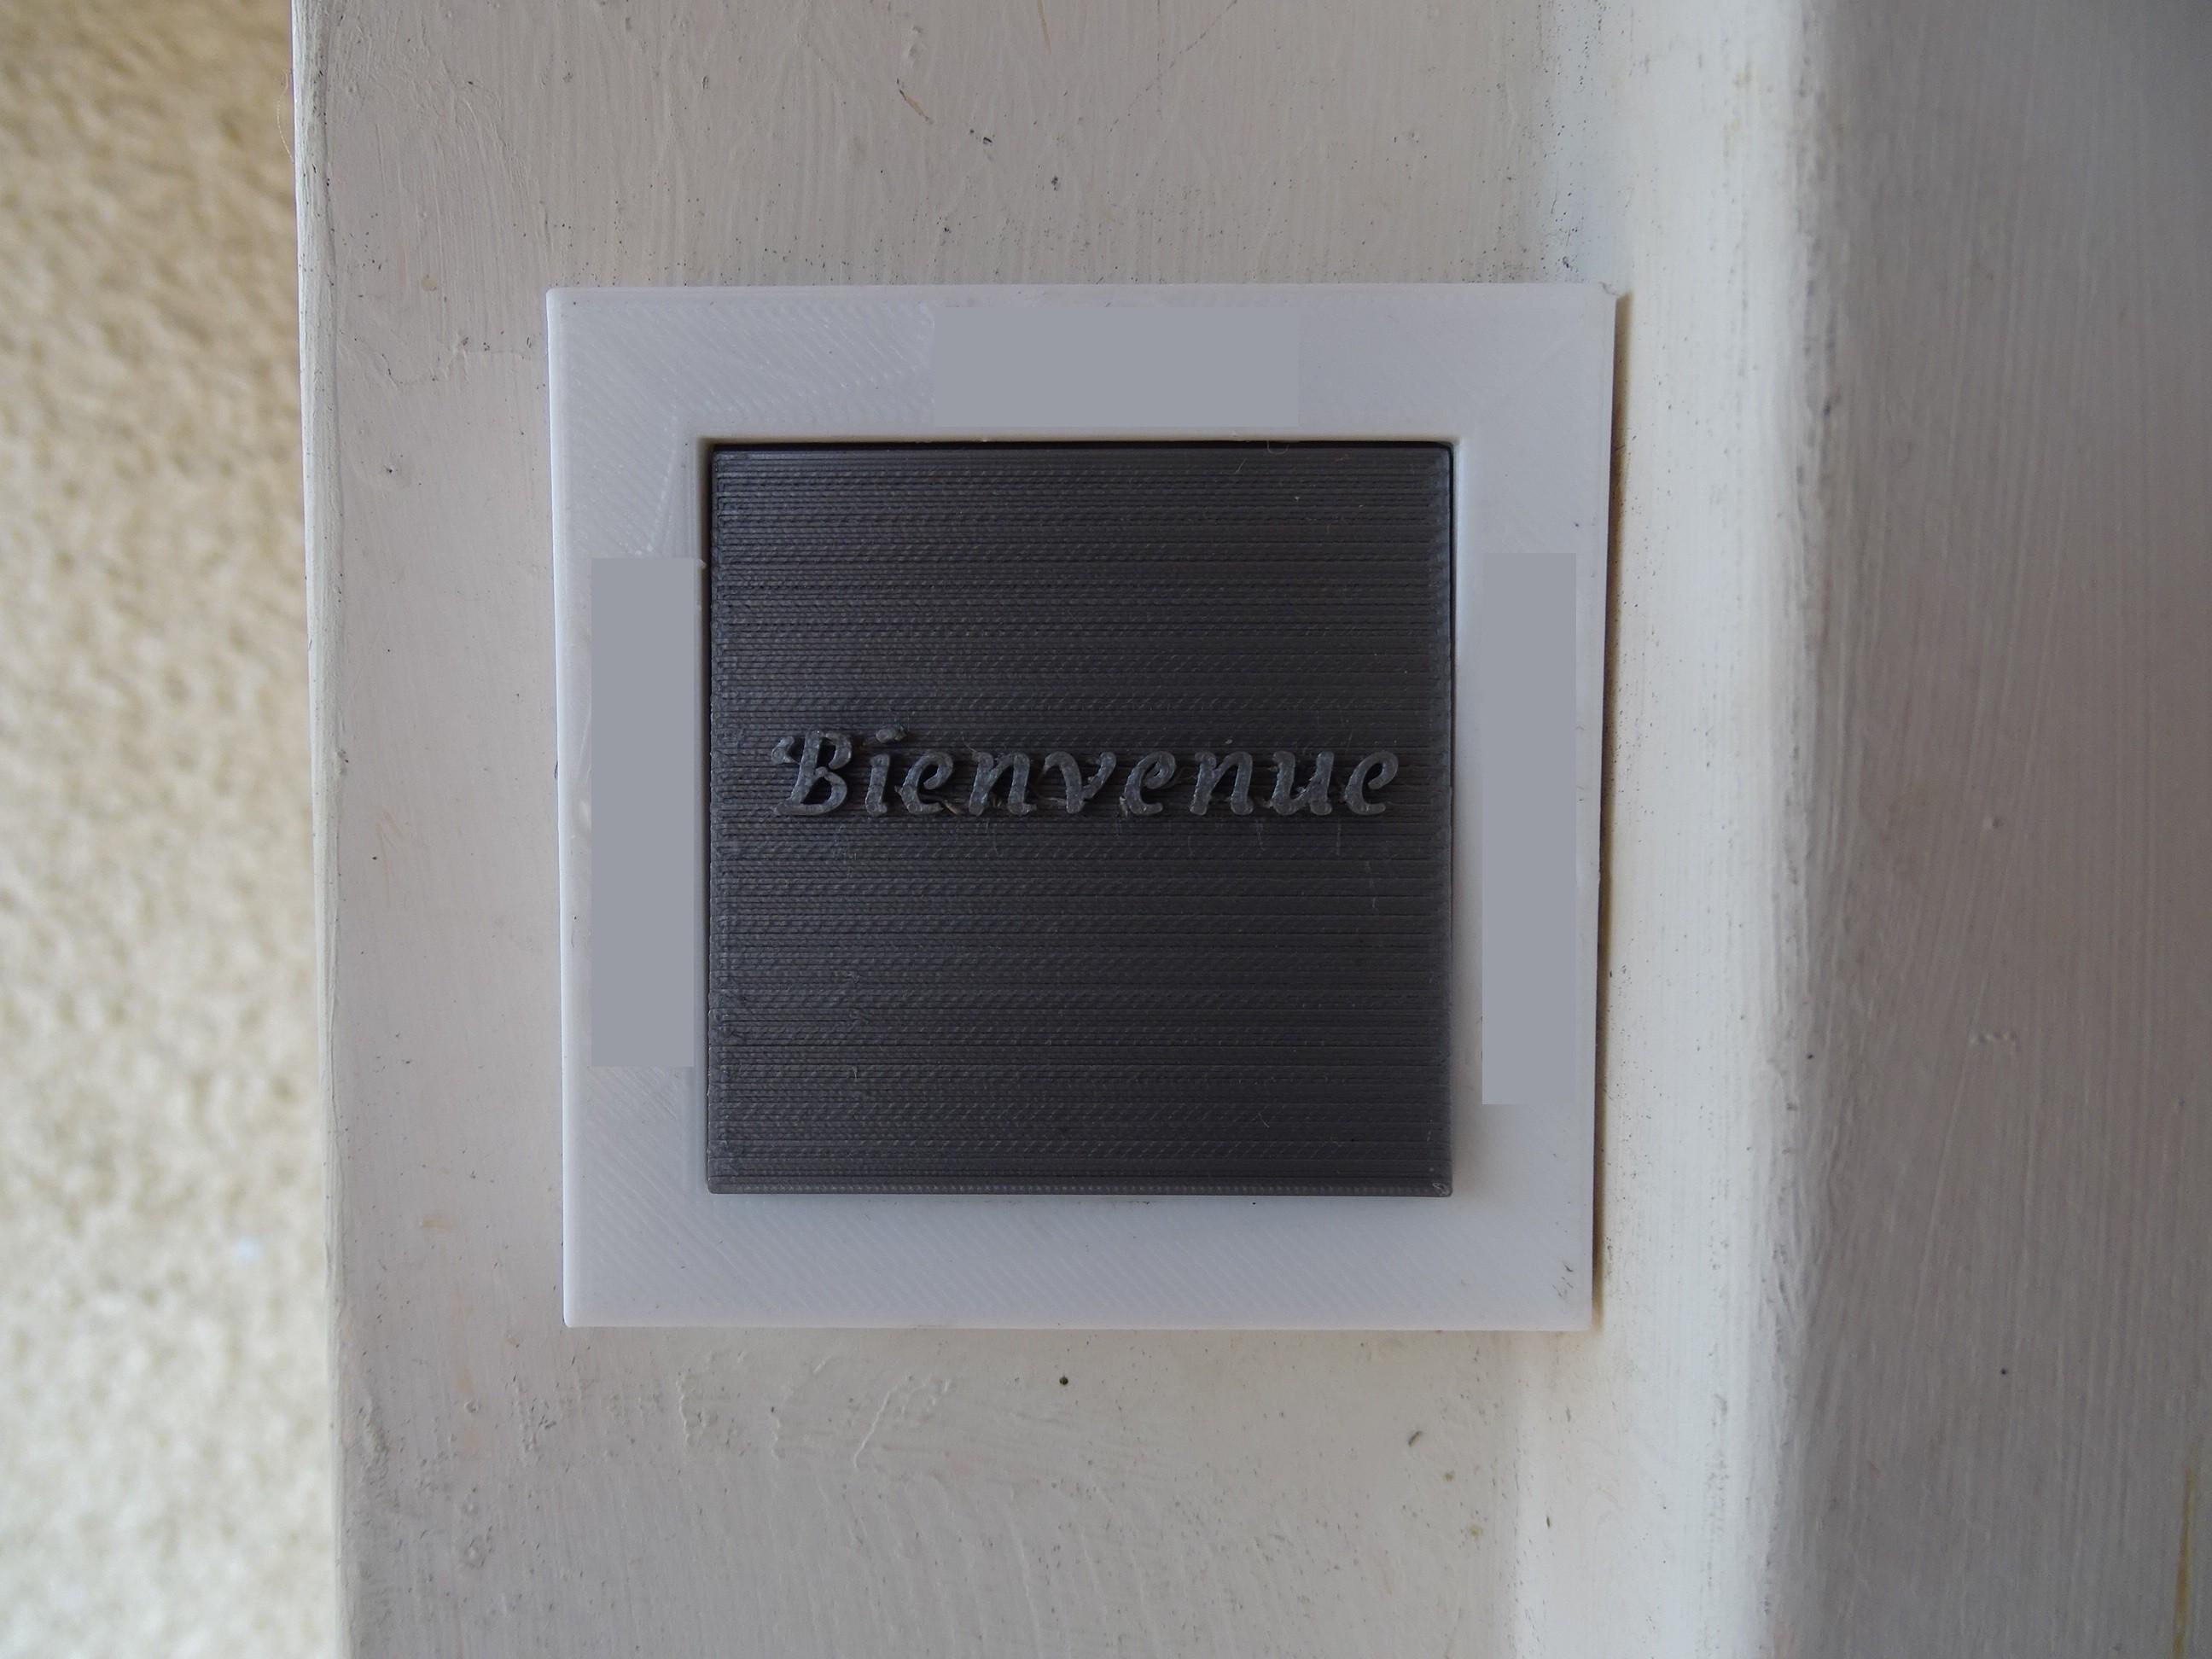 Sonnette Bienvenue.jpg Download free STL file Sonnette Welcome • 3D printer object, LaWouattebete